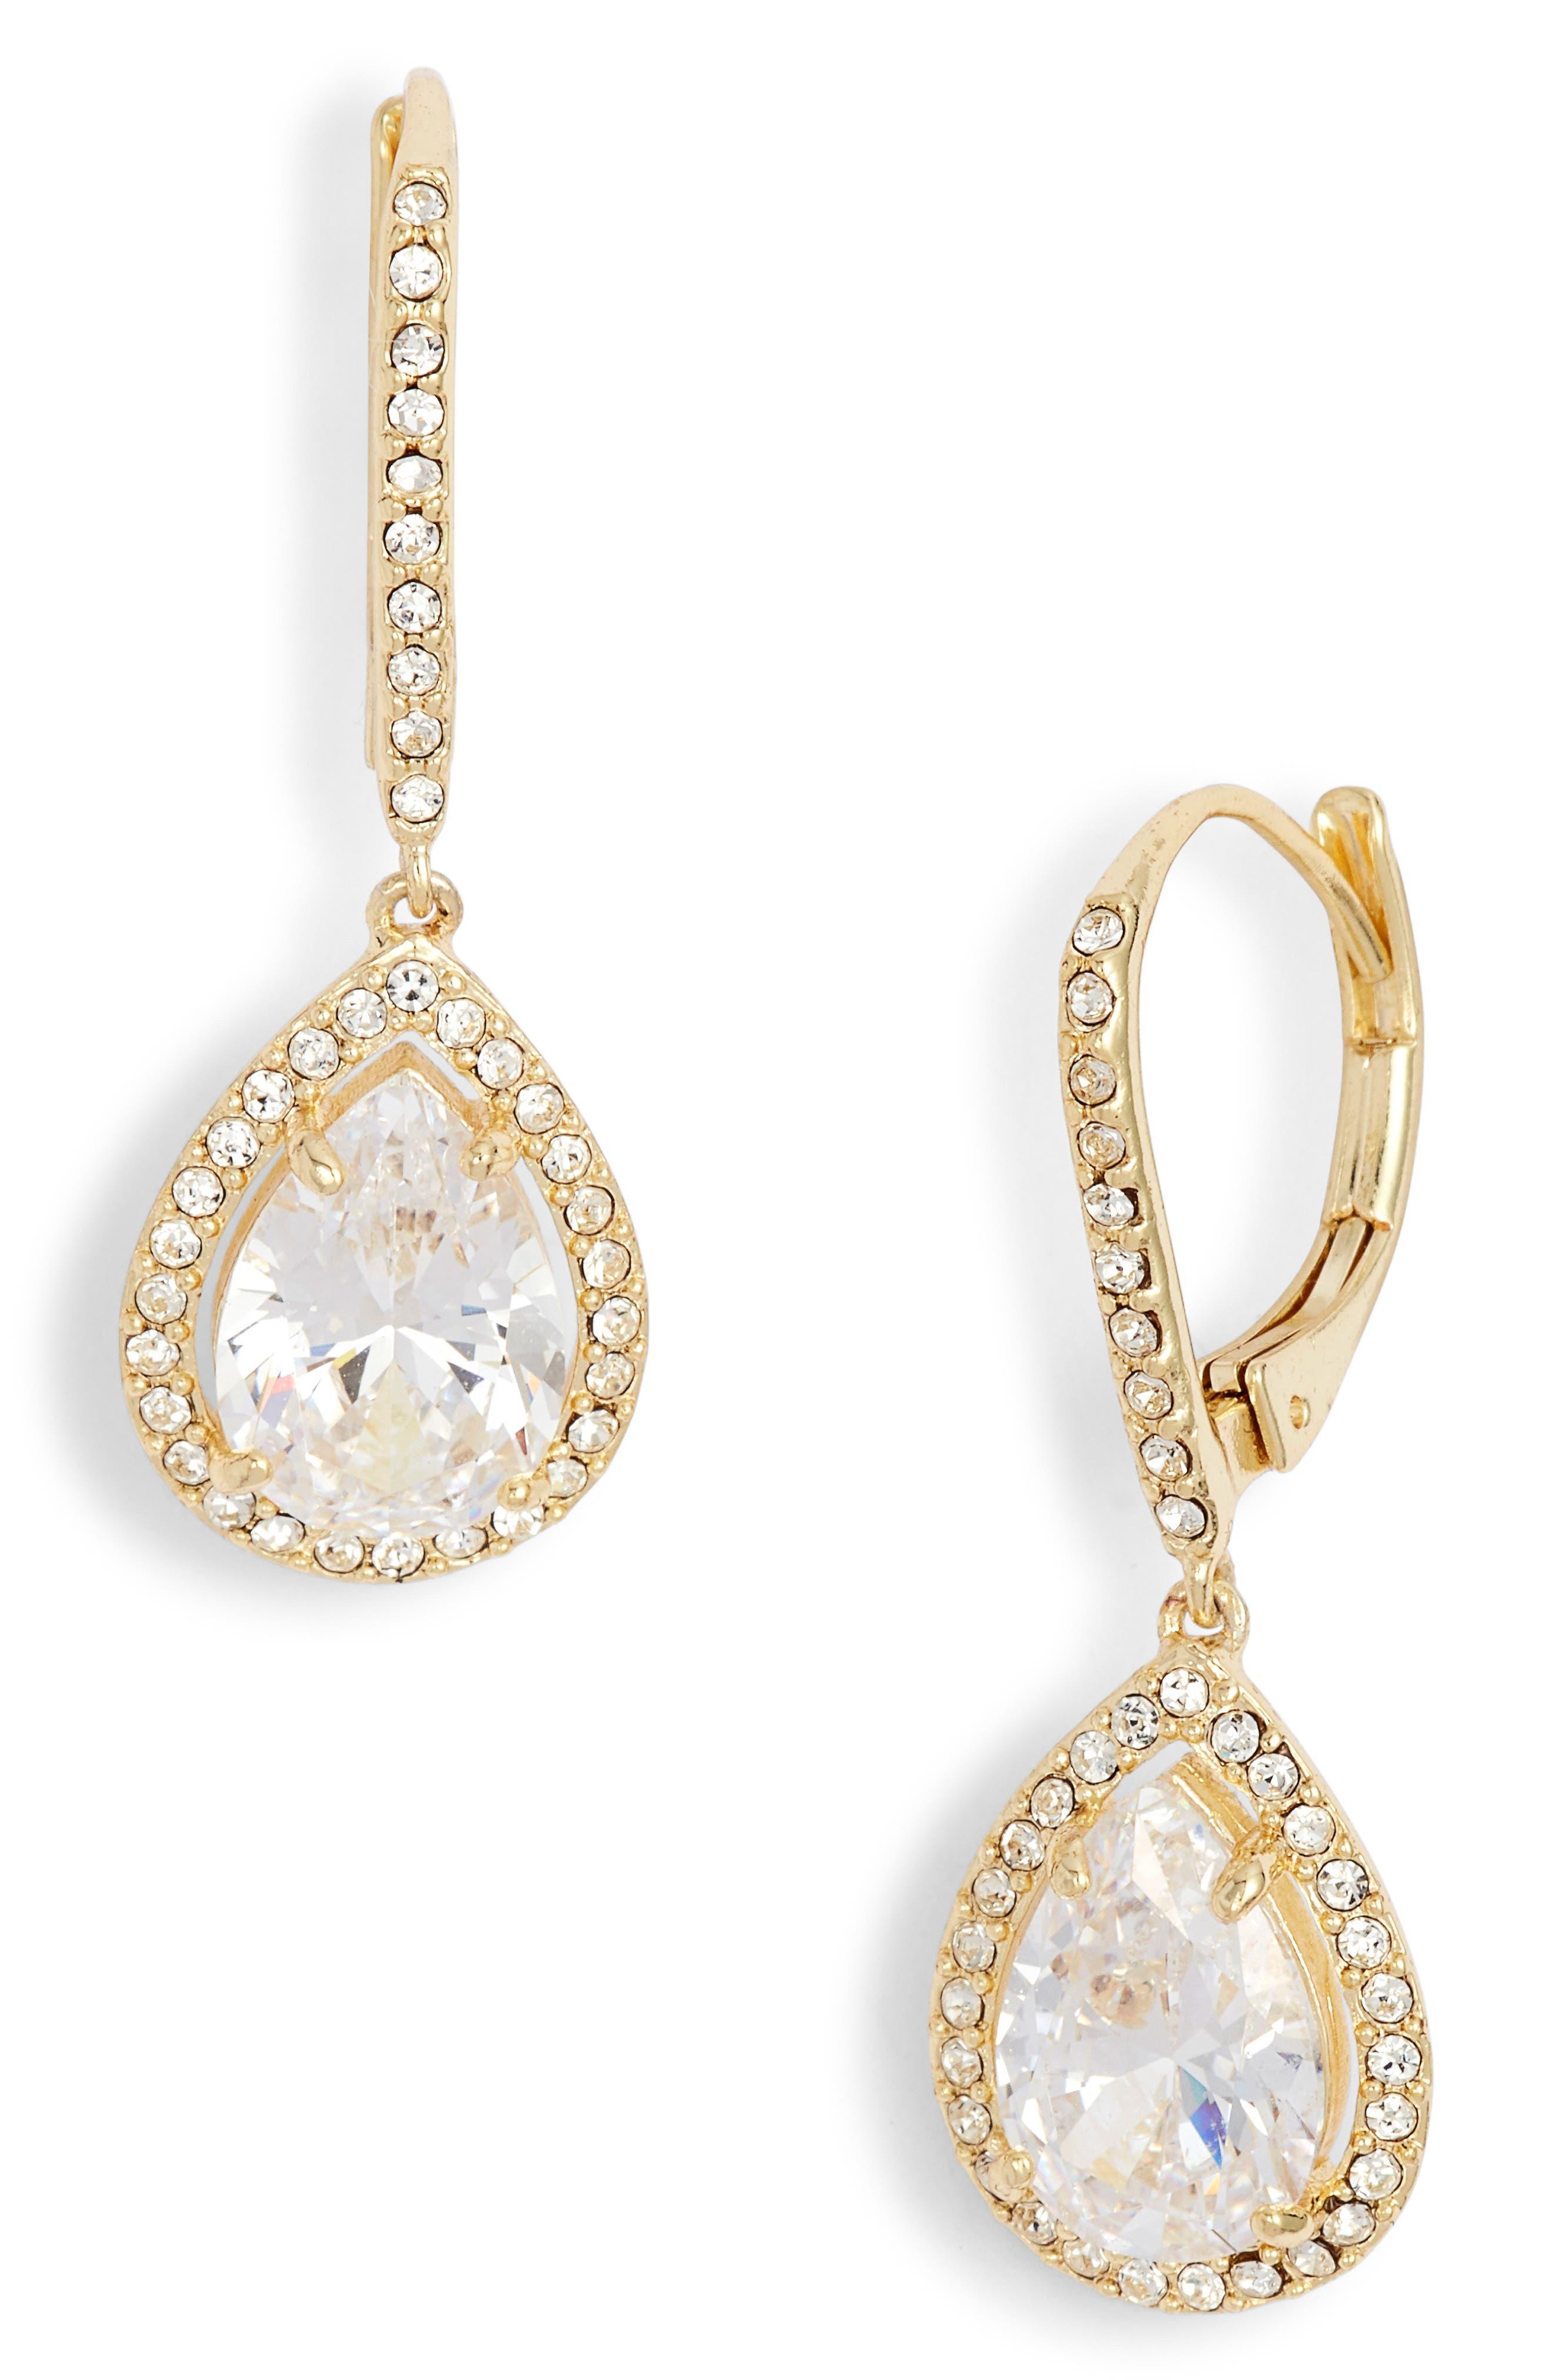 Cubic Zirconia Drop Earrings,                             Main thumbnail 1, color,                             CLEAR- GOLD